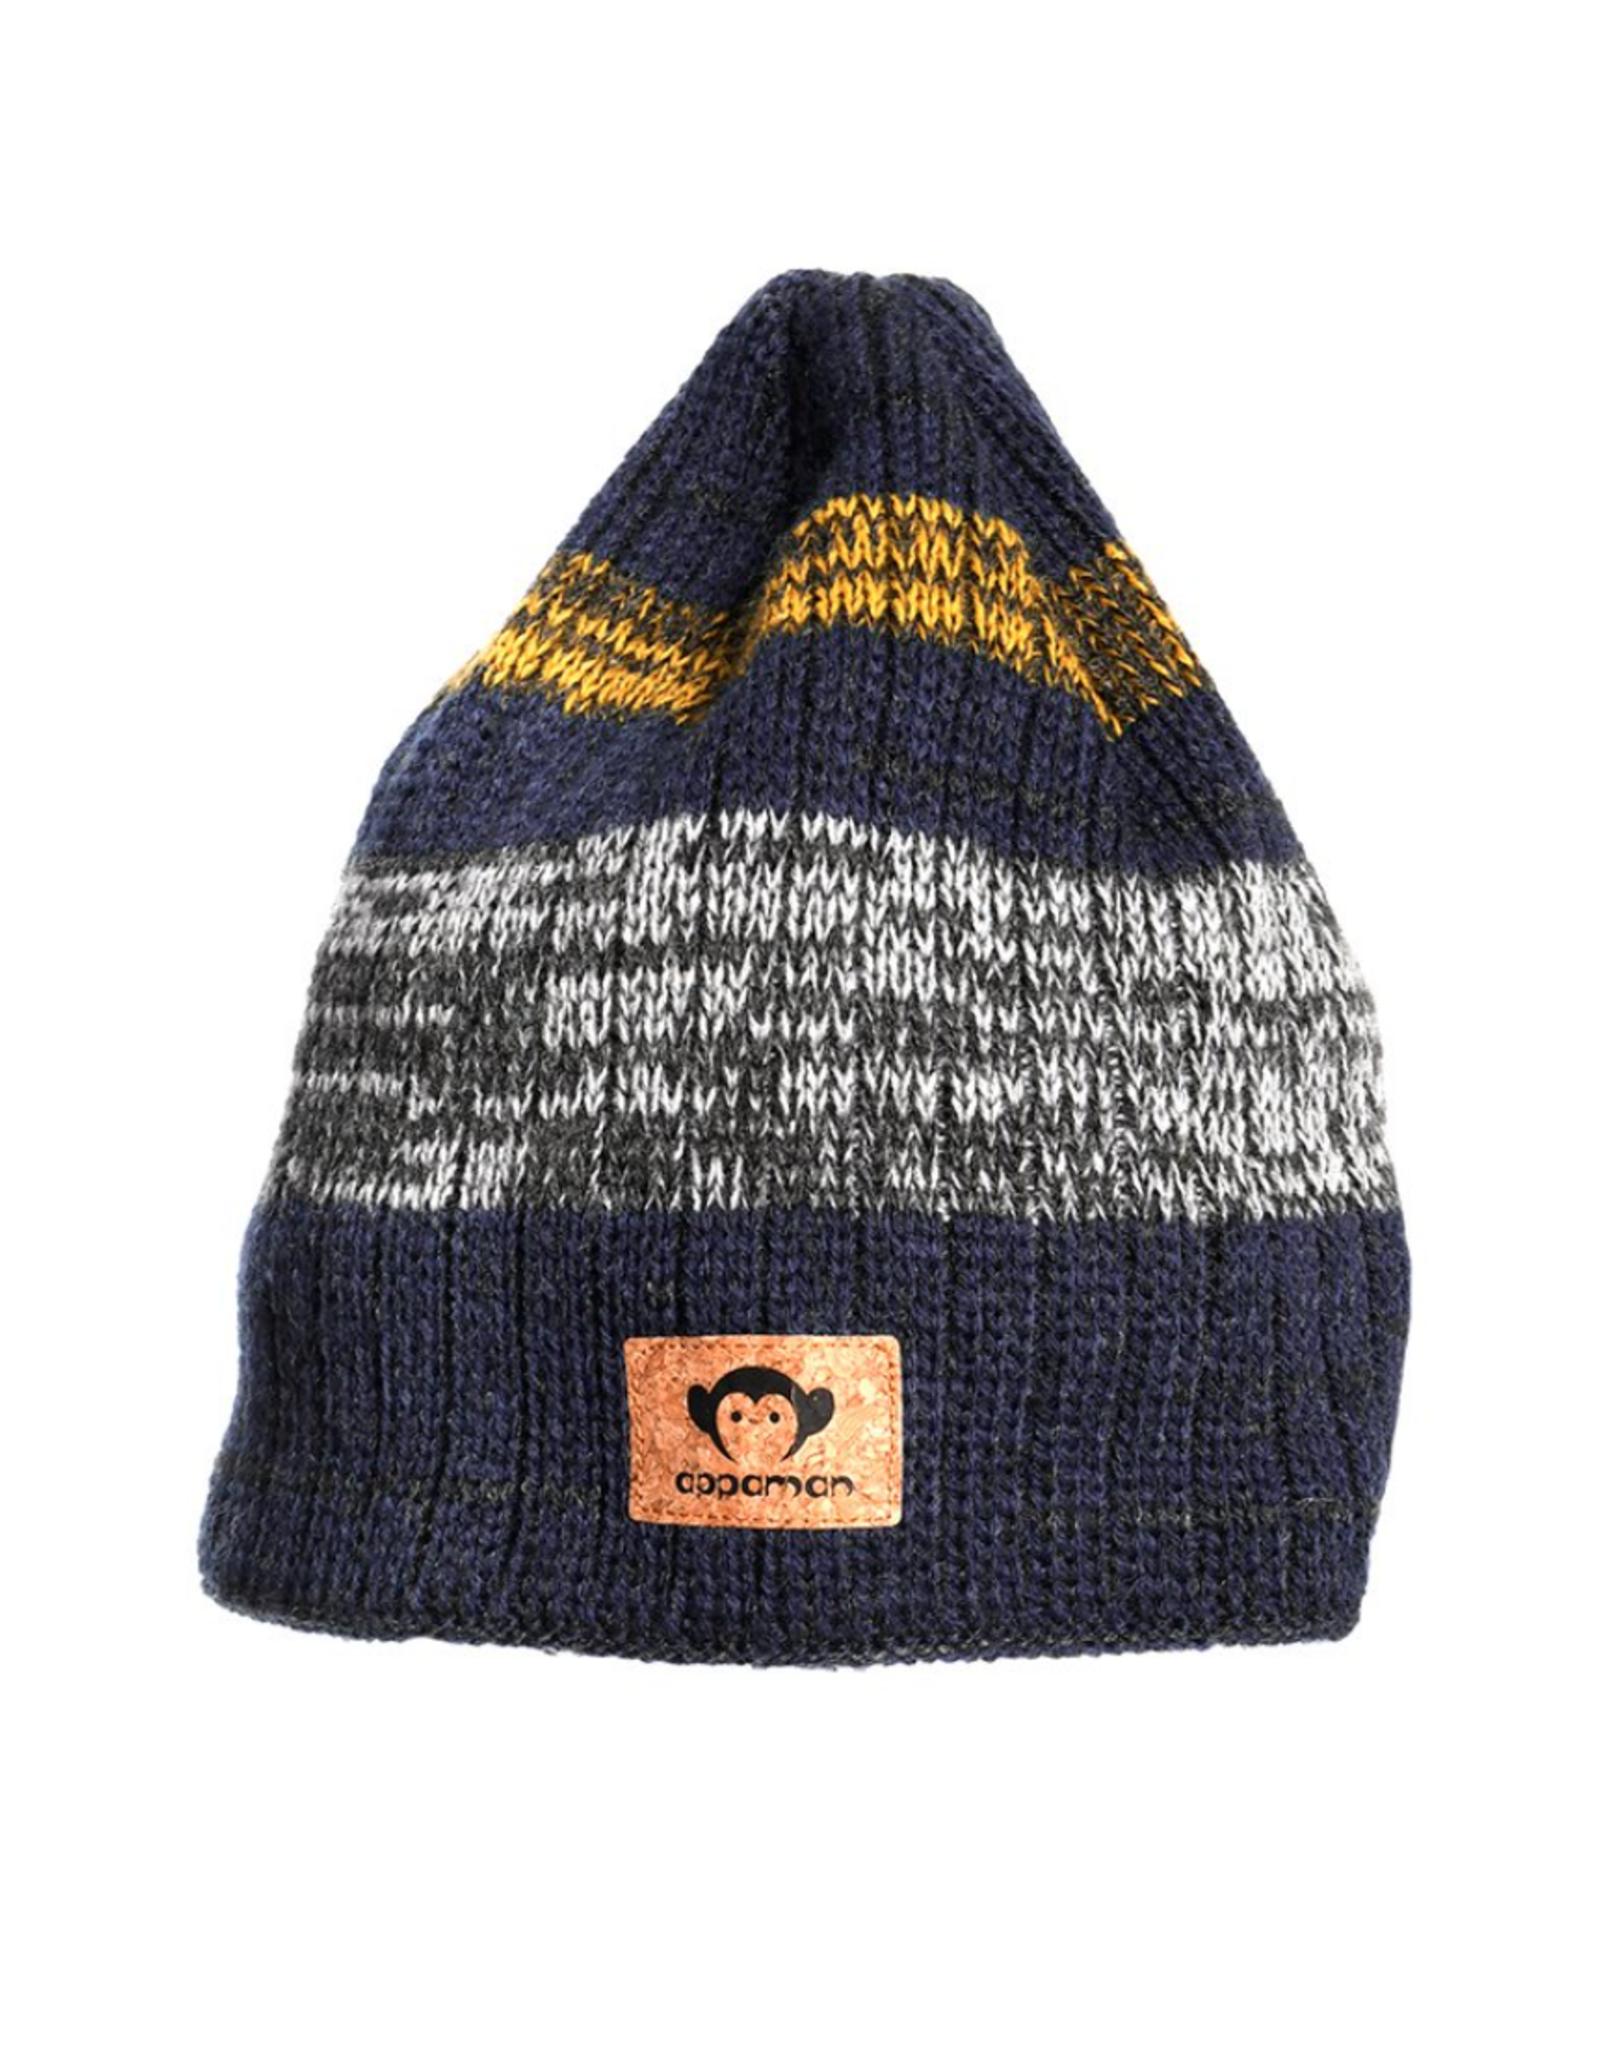 Appaman Appaman Bondo Hat